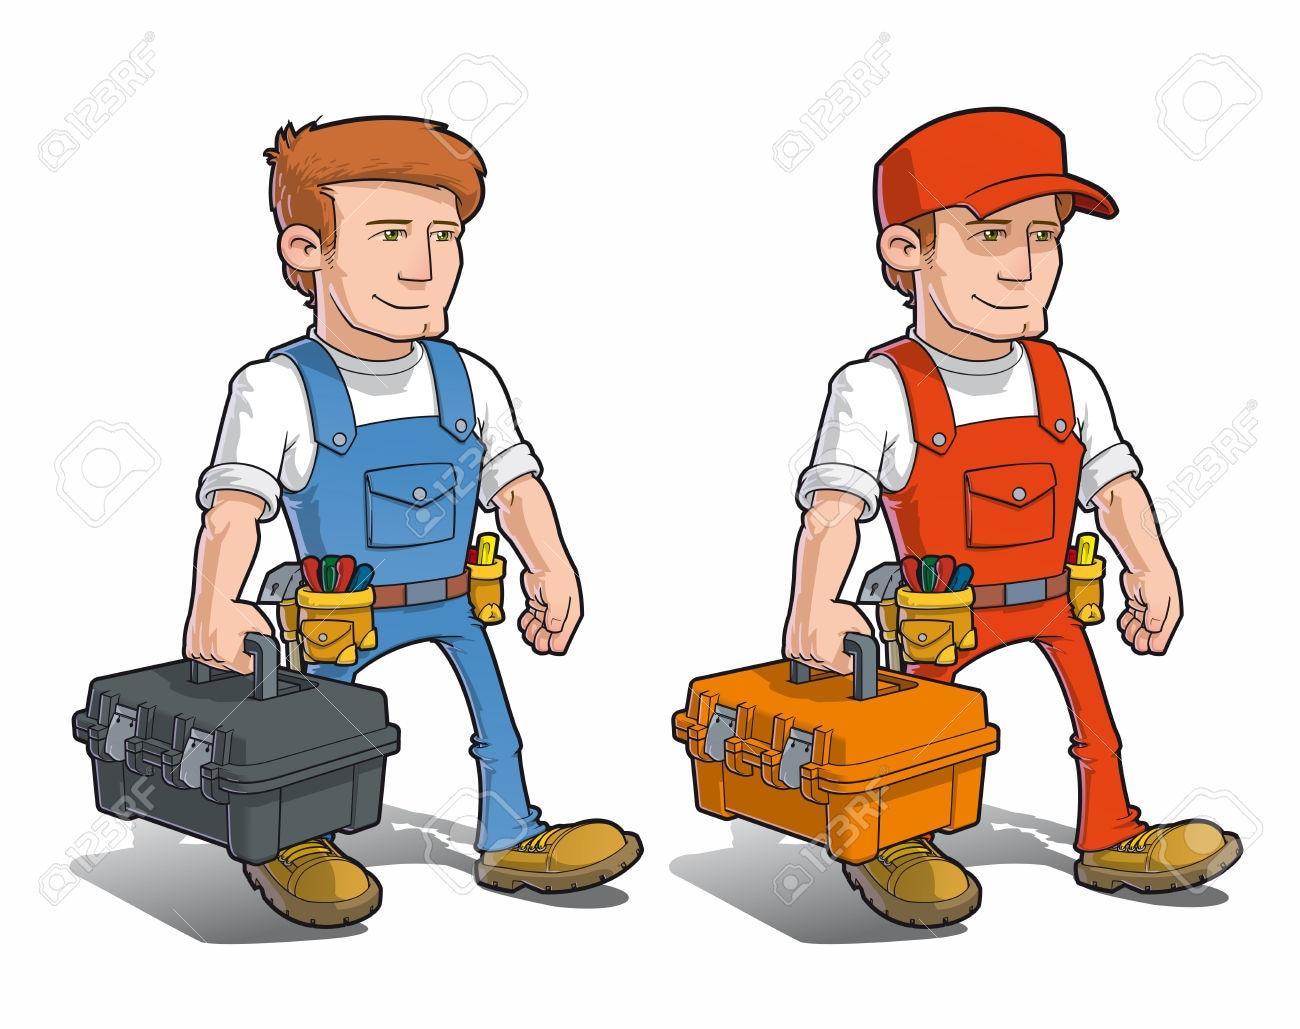 Dixon & Son Handyman Services